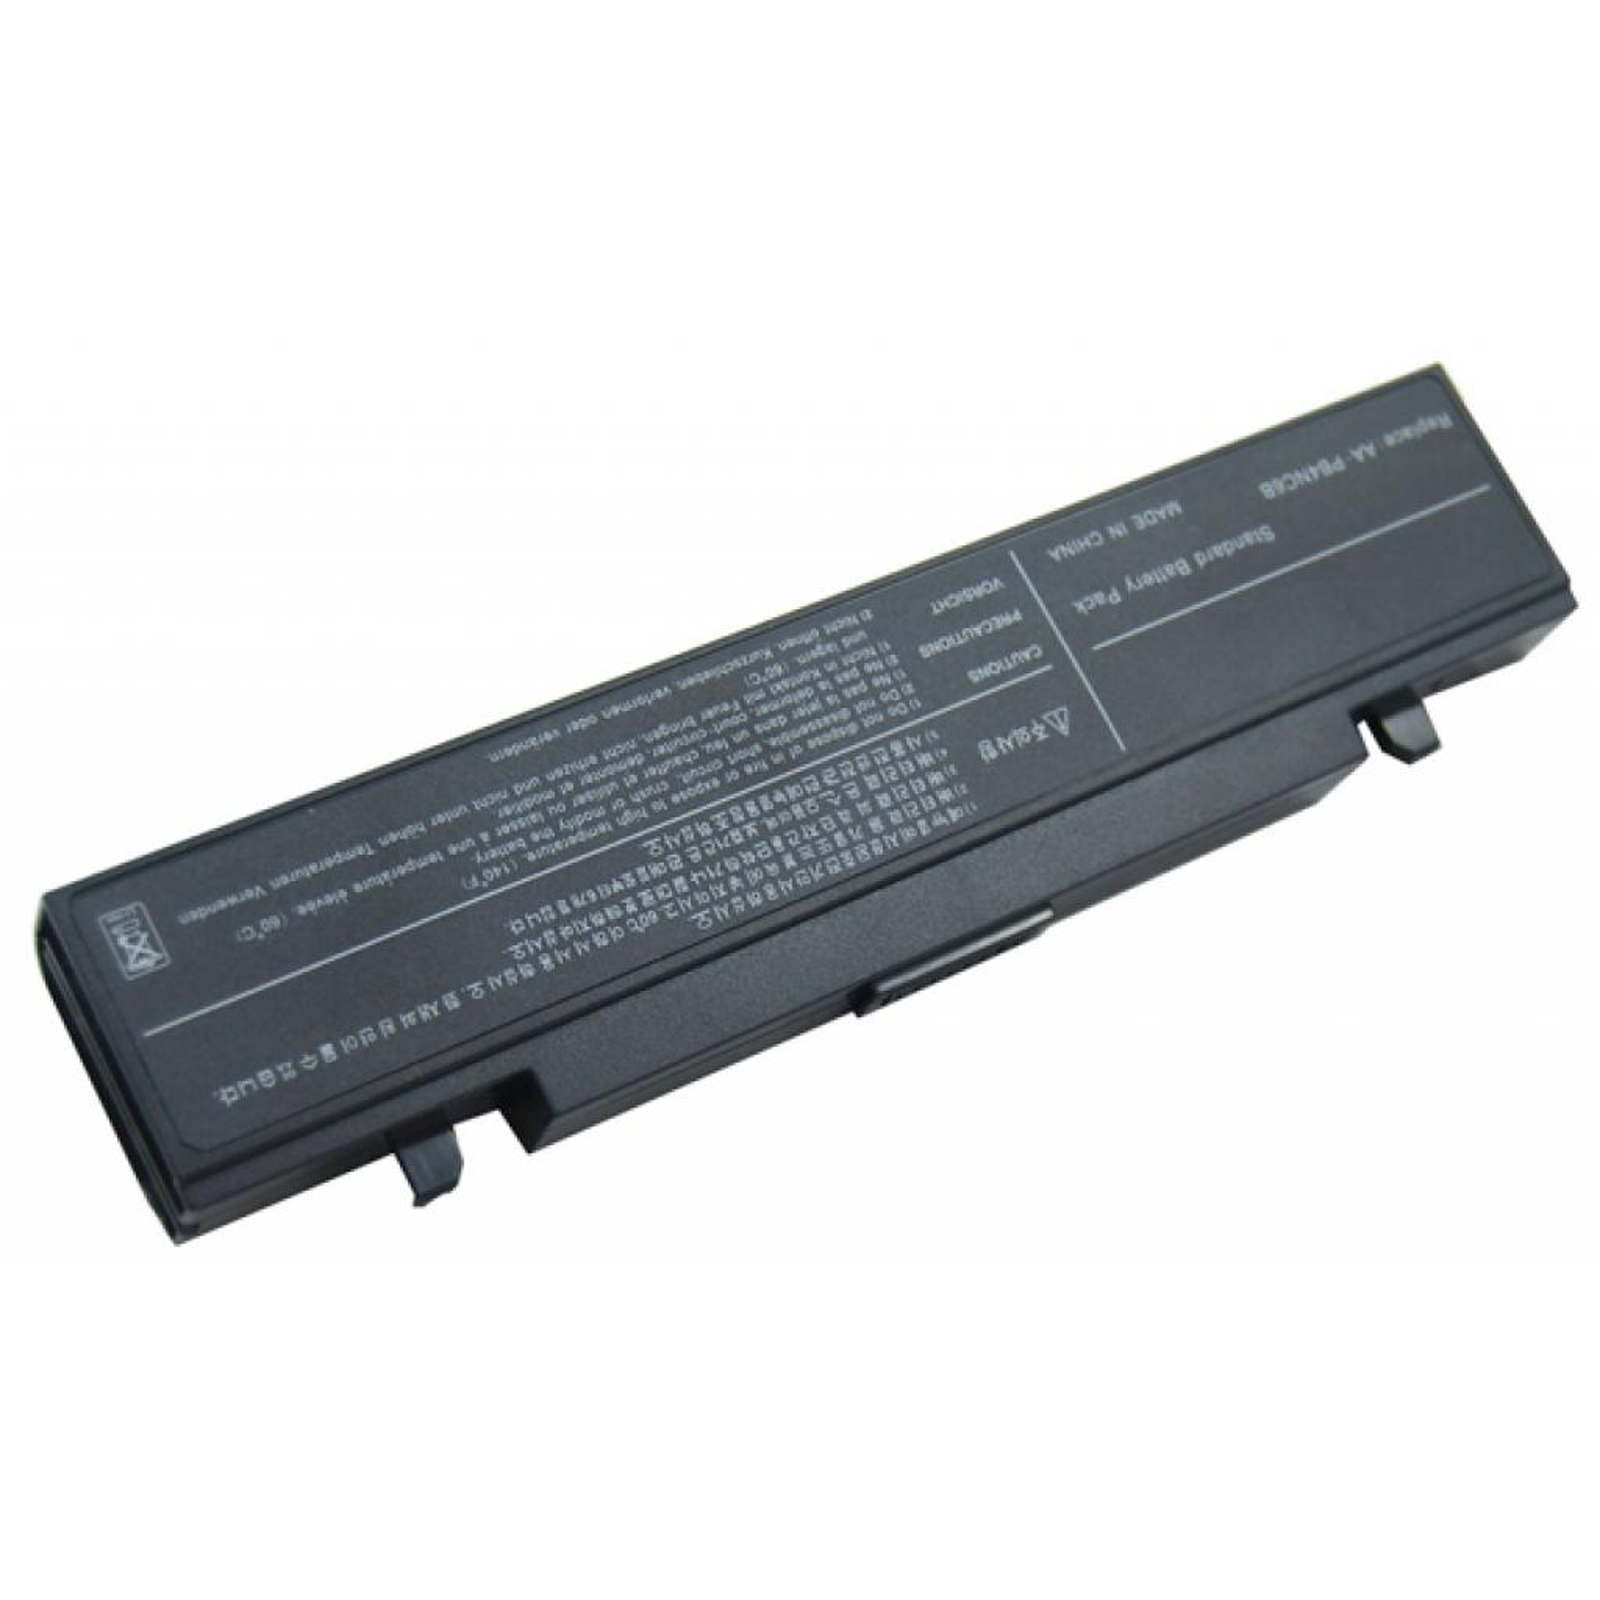 Аккумулятор для ноутбука TOSHIBA Dynabook T752 (PA5024U-1BRS) 10.8V 4400mAh PowerPlant (NB00000040)